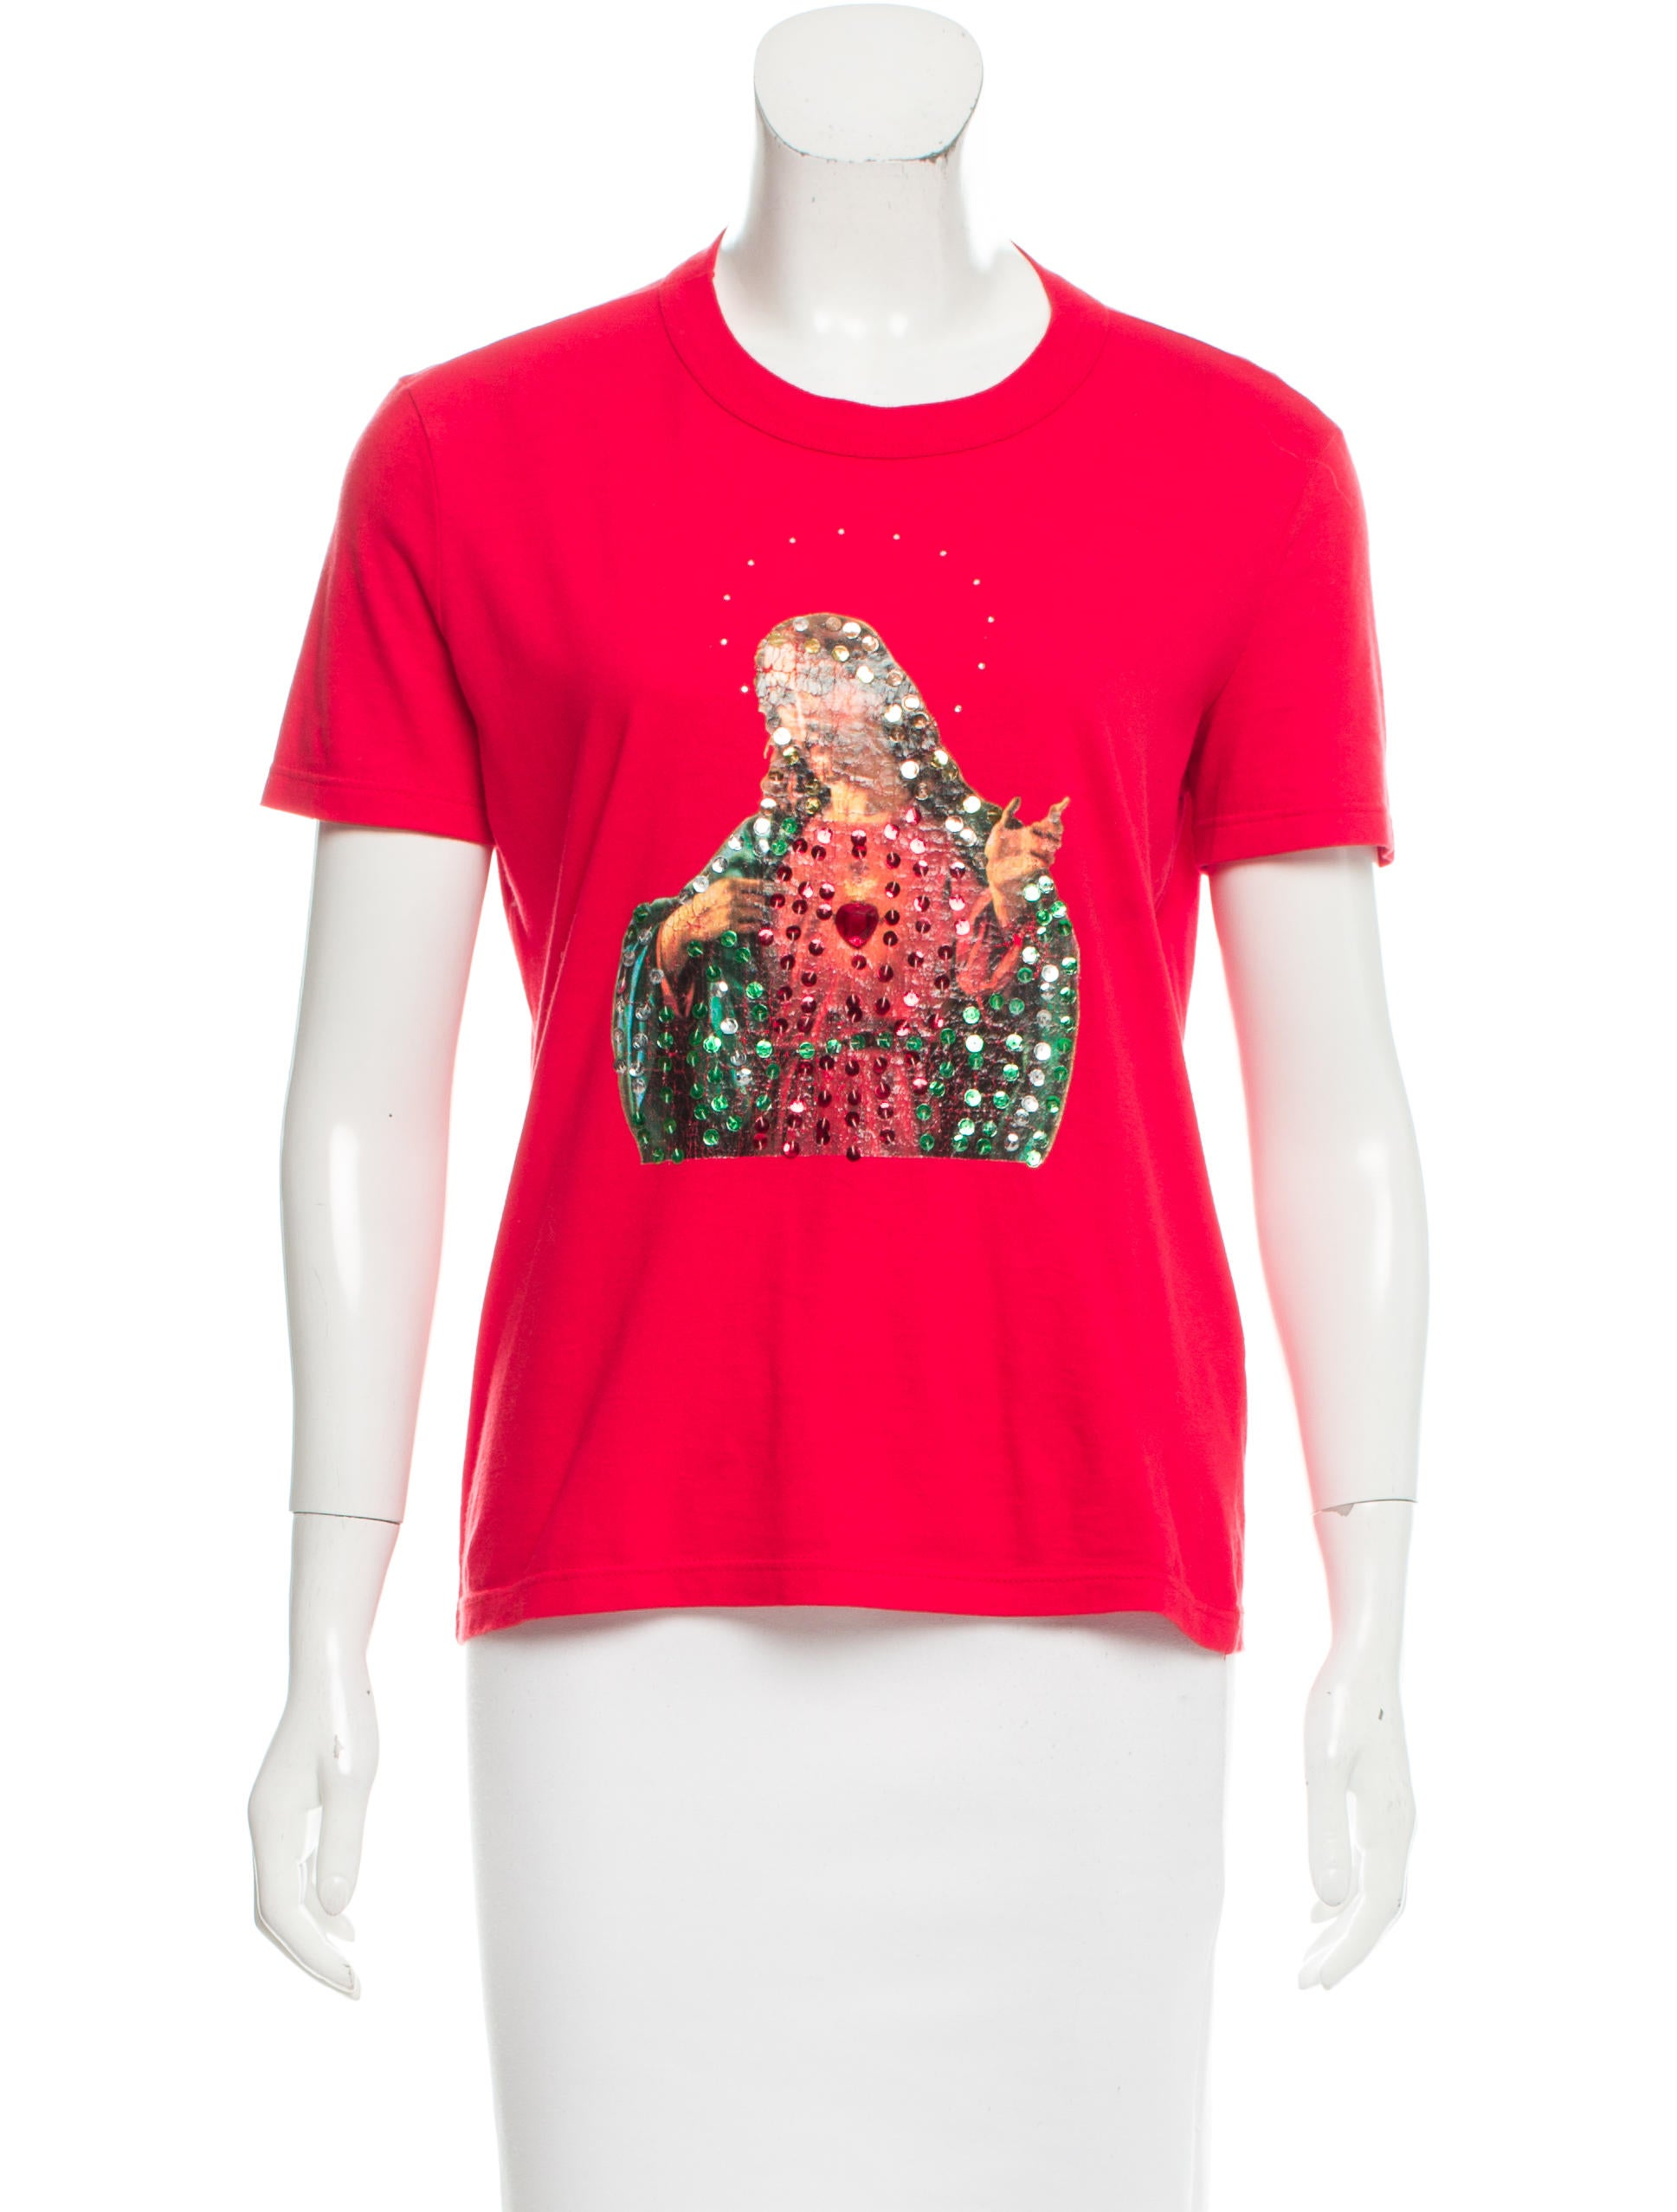 D G Embellished Screen Print T Shirt Clothing Wdg36305